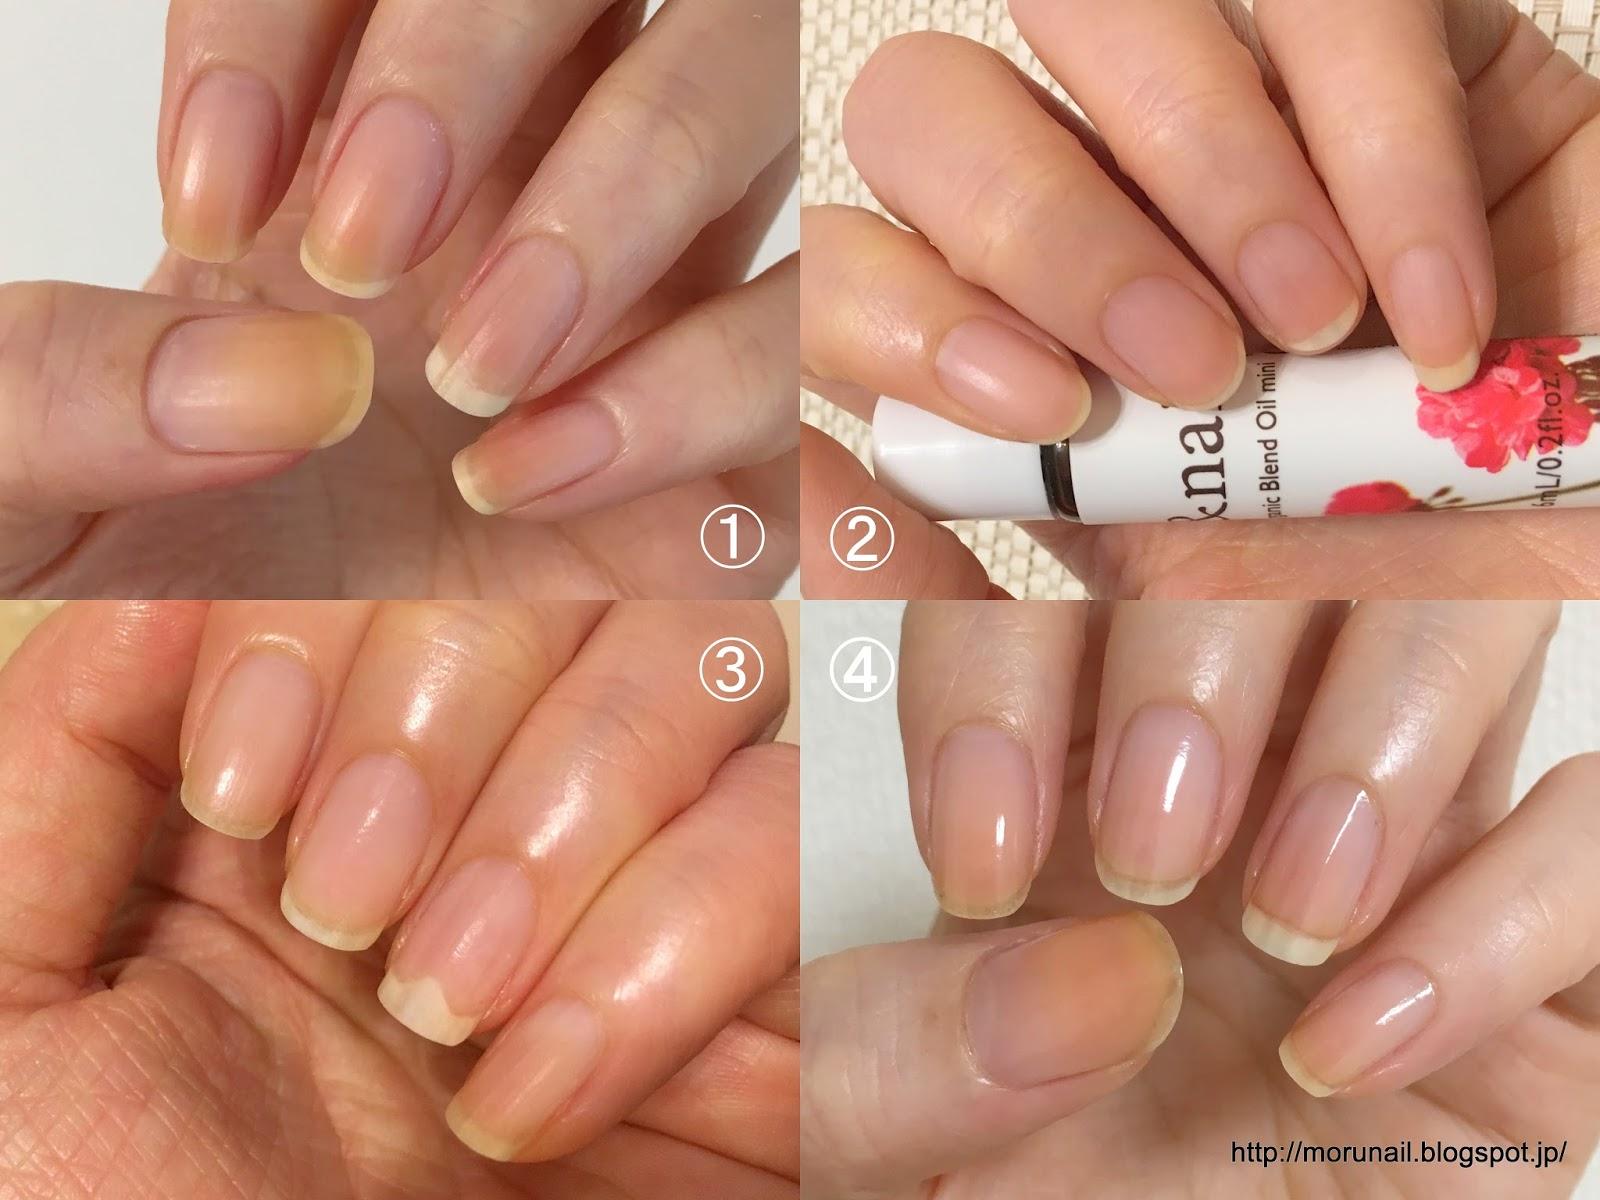 Moru\u0027s nails (実証)やっぱり爪を伸ばしたほうがネイルベッド